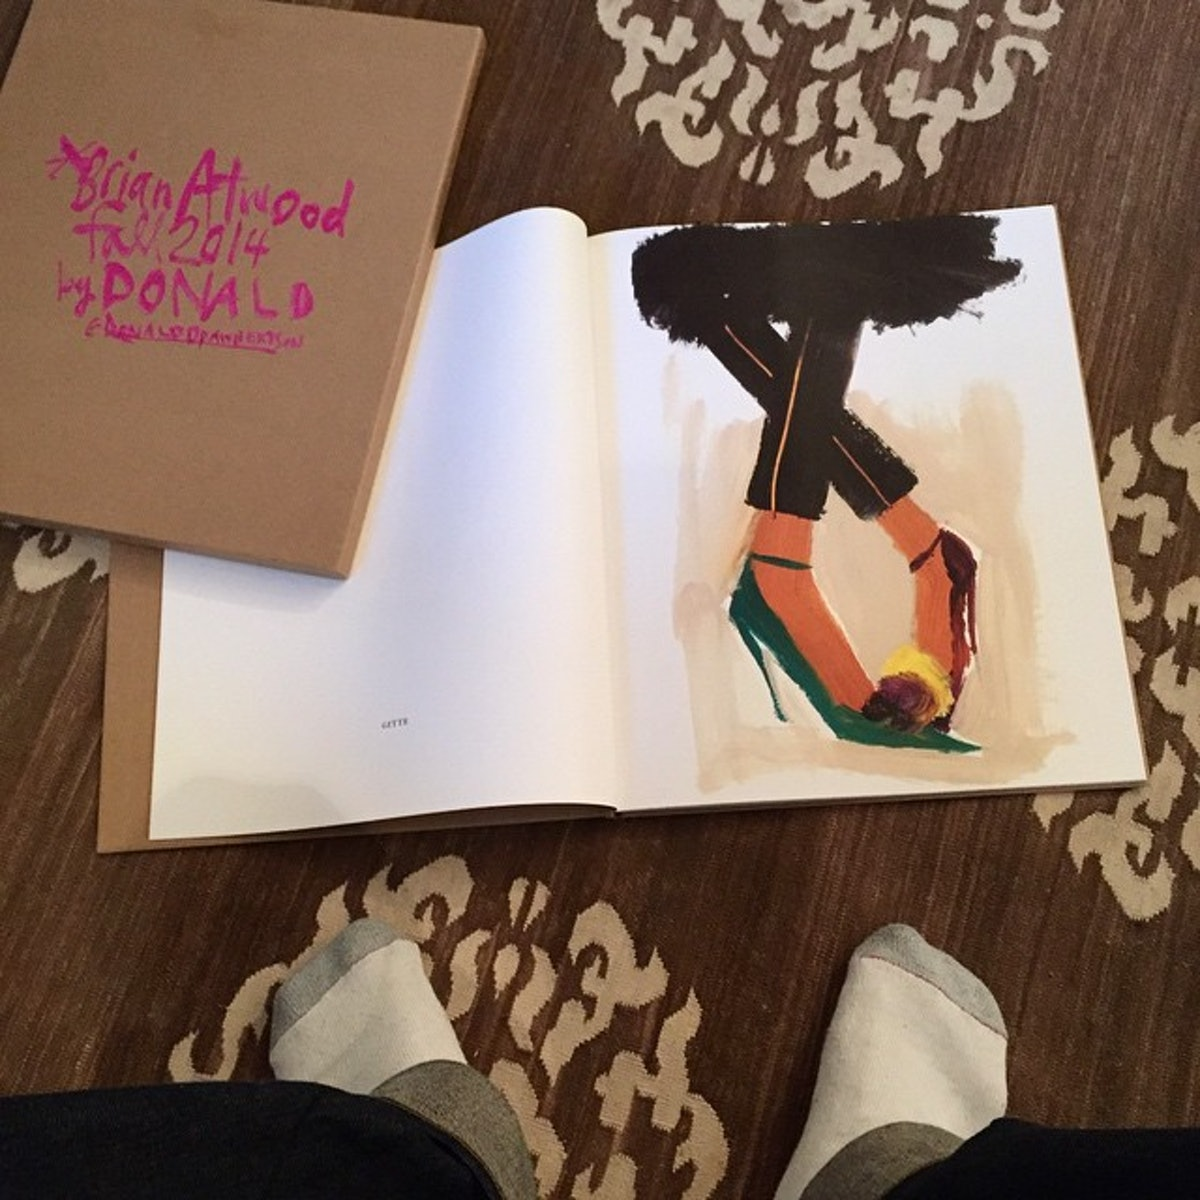 Brian Atwood book Donald Robertson